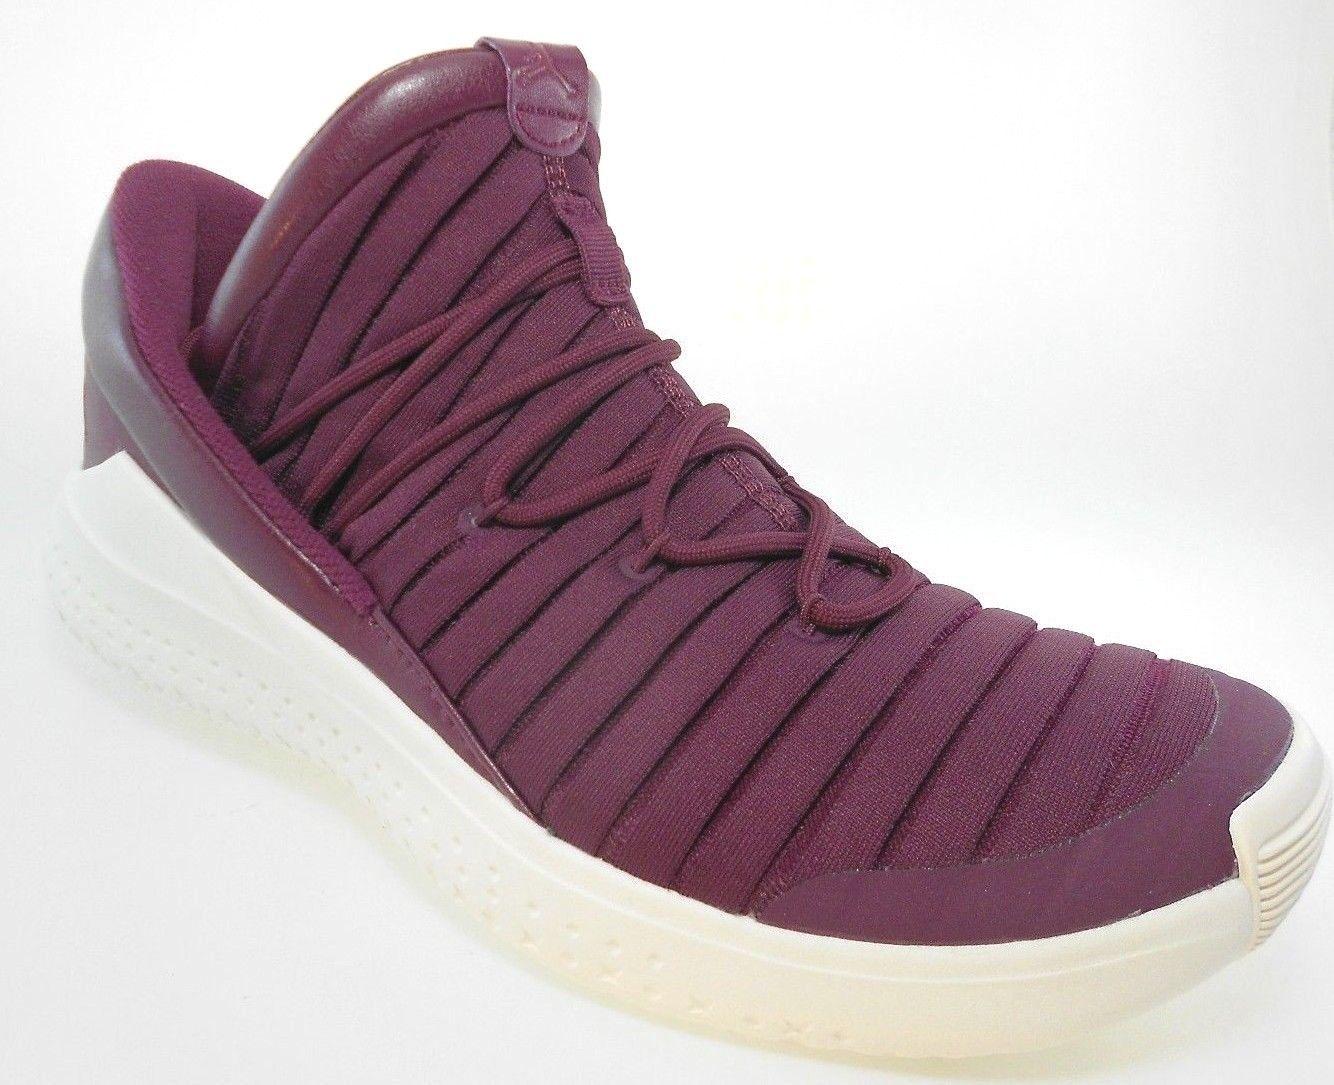 43504acdcd0 Nike Air Jordan Flight Luxe Men s Slip On and 10 similar items